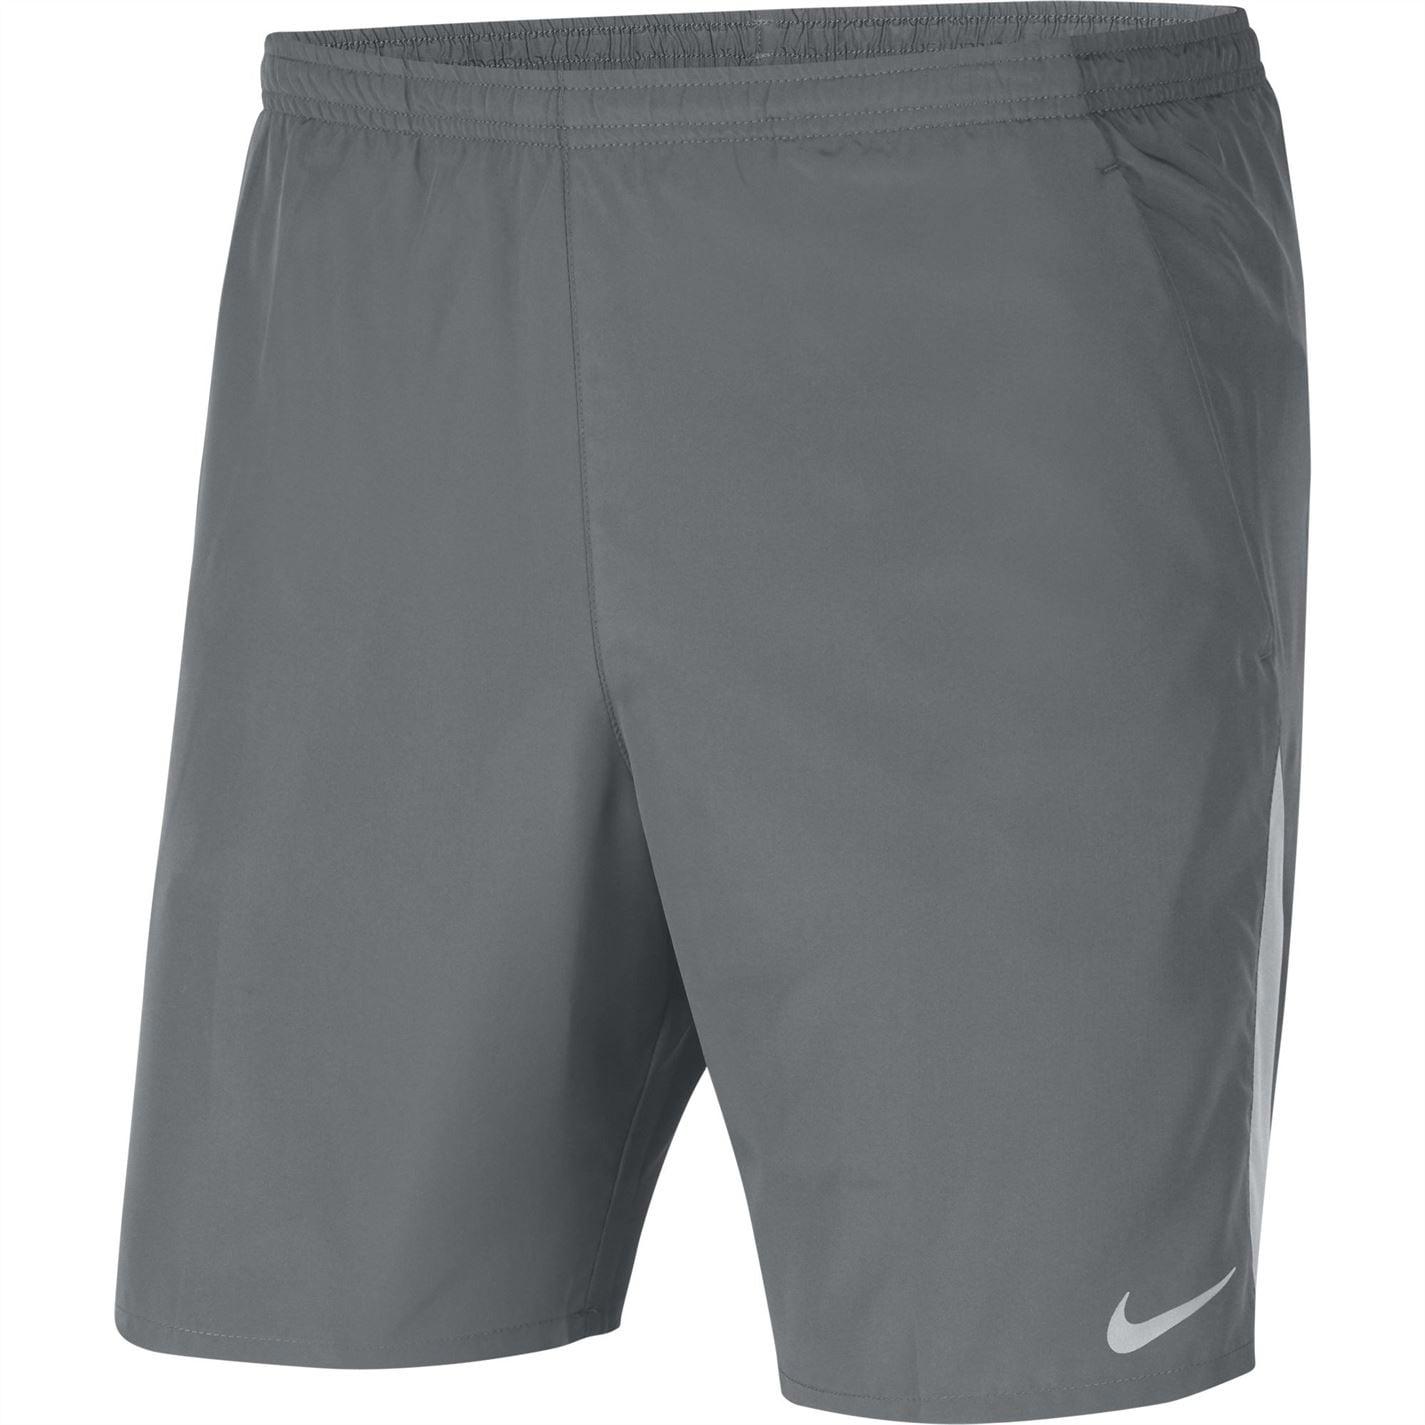 Mergi la Pantaloni scurti Nike 7 alergare pentru Barbati gri